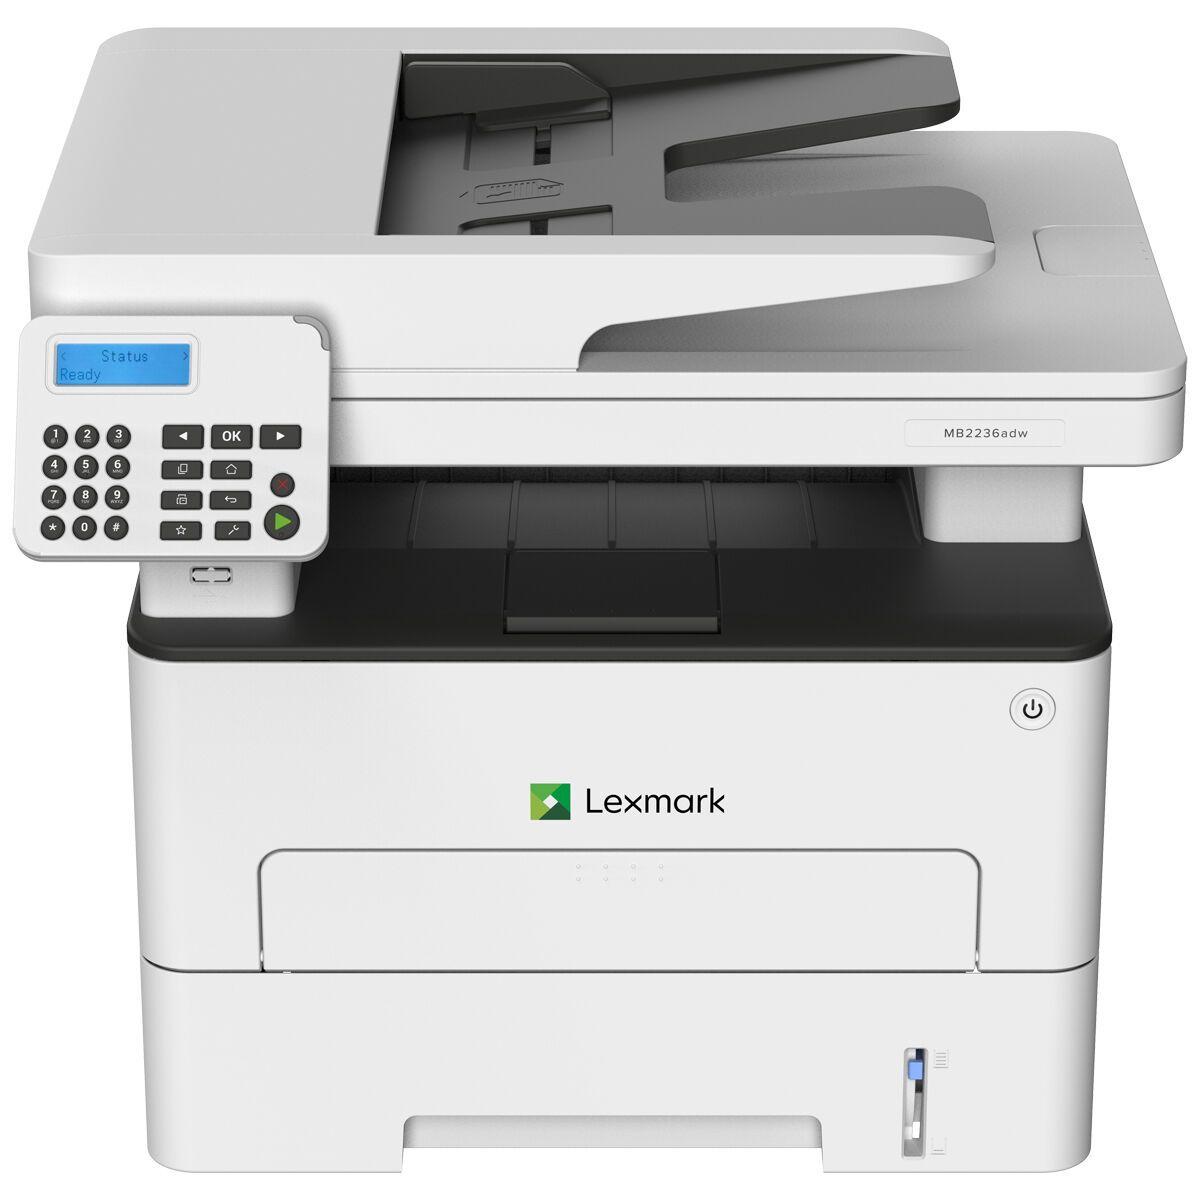 [NBB] Lexmark MB2236adw Tiefpreis